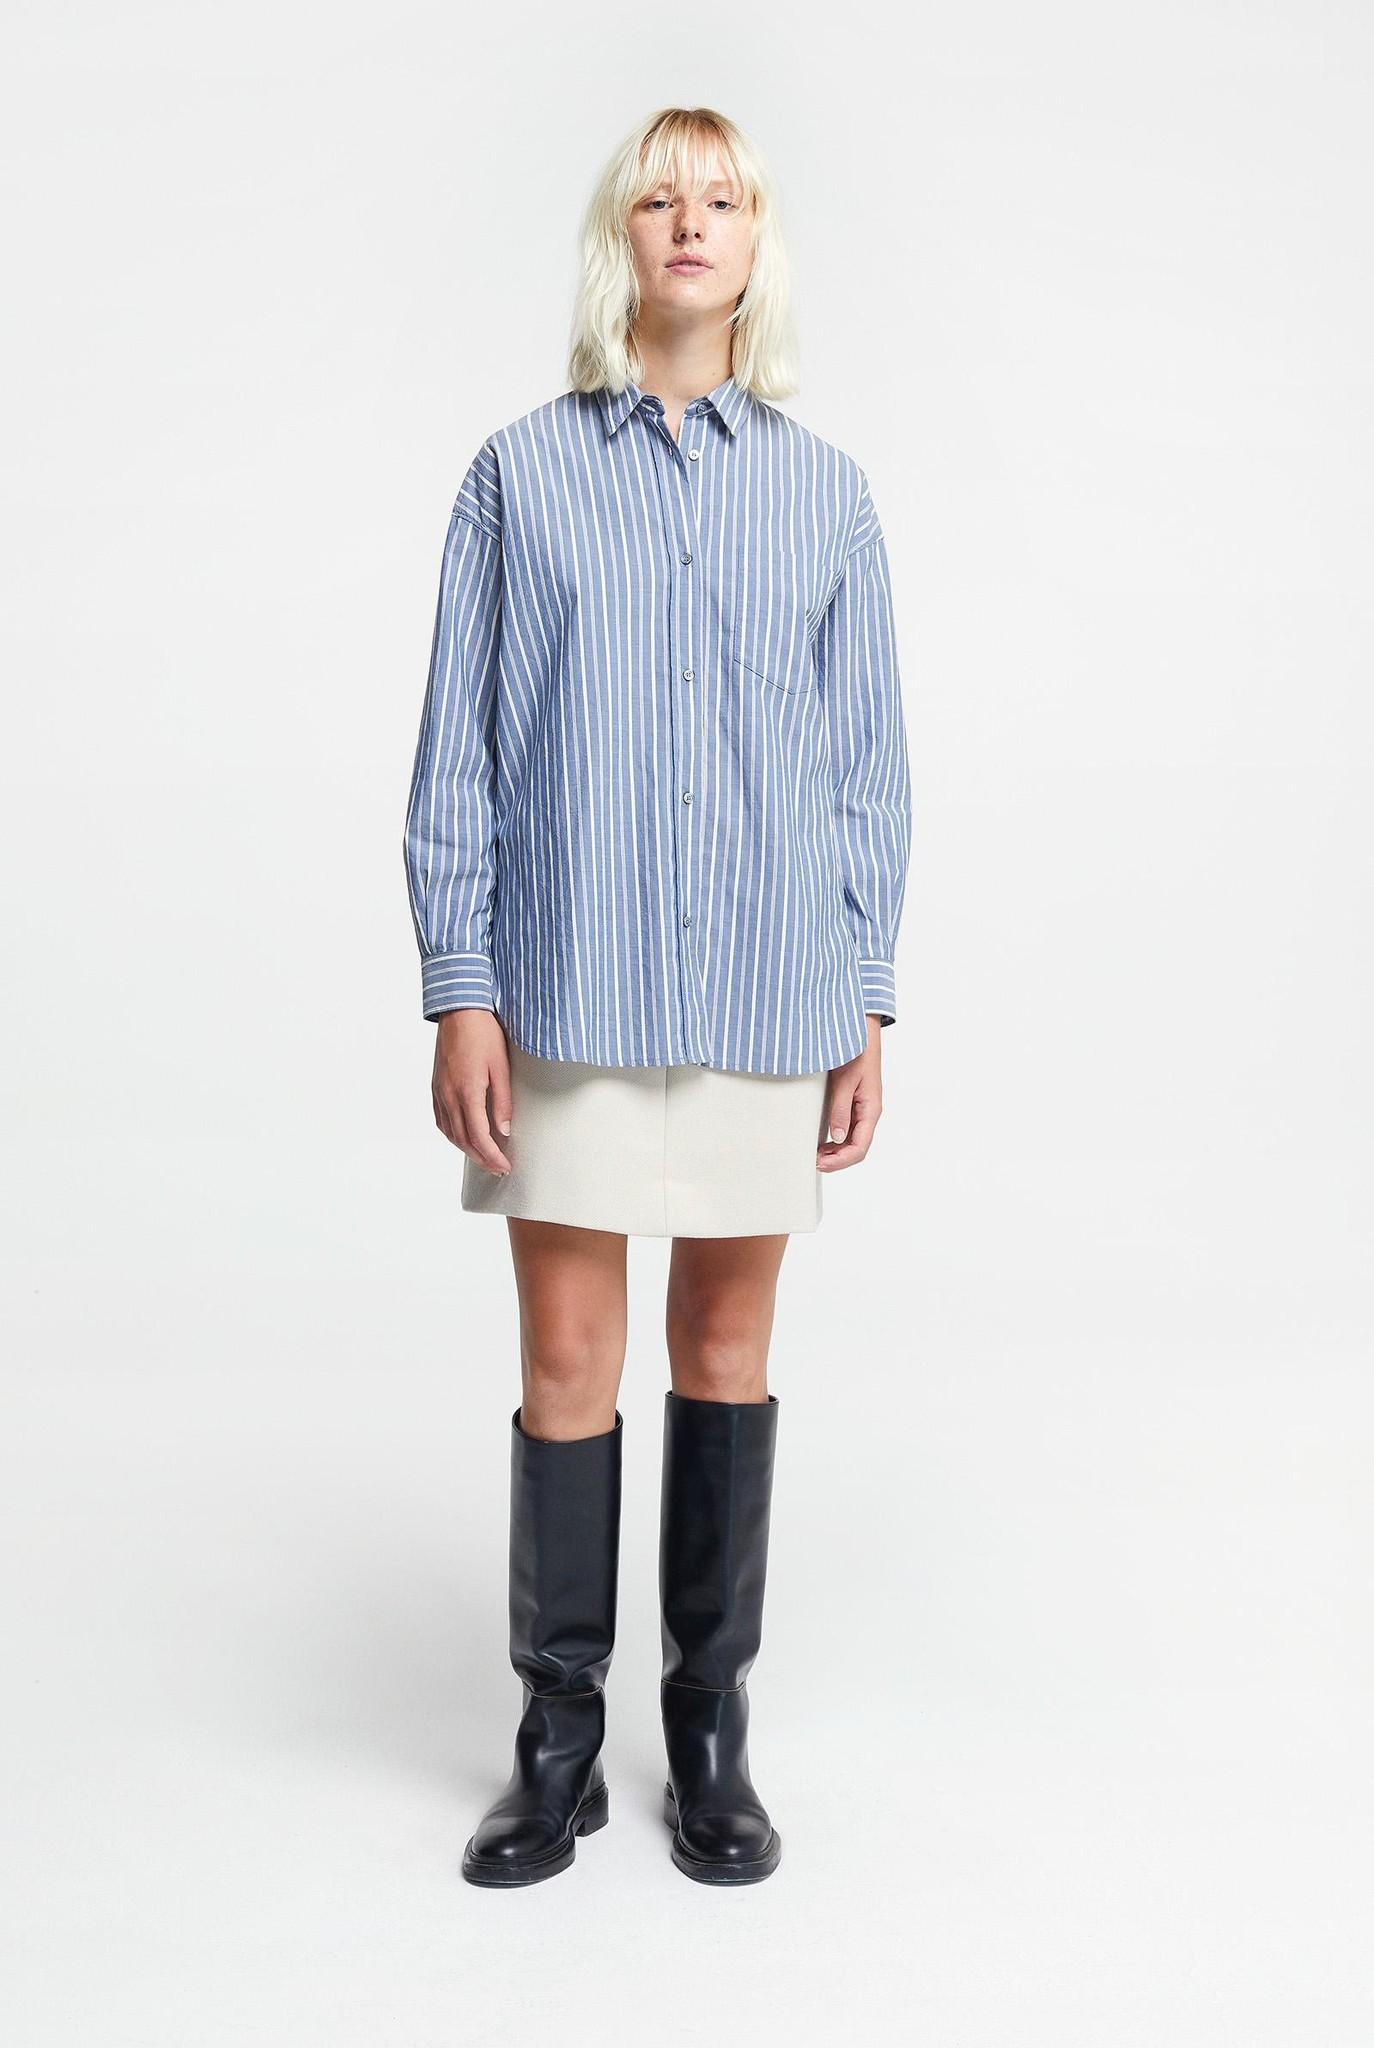 oversized blouse blue / white stripes